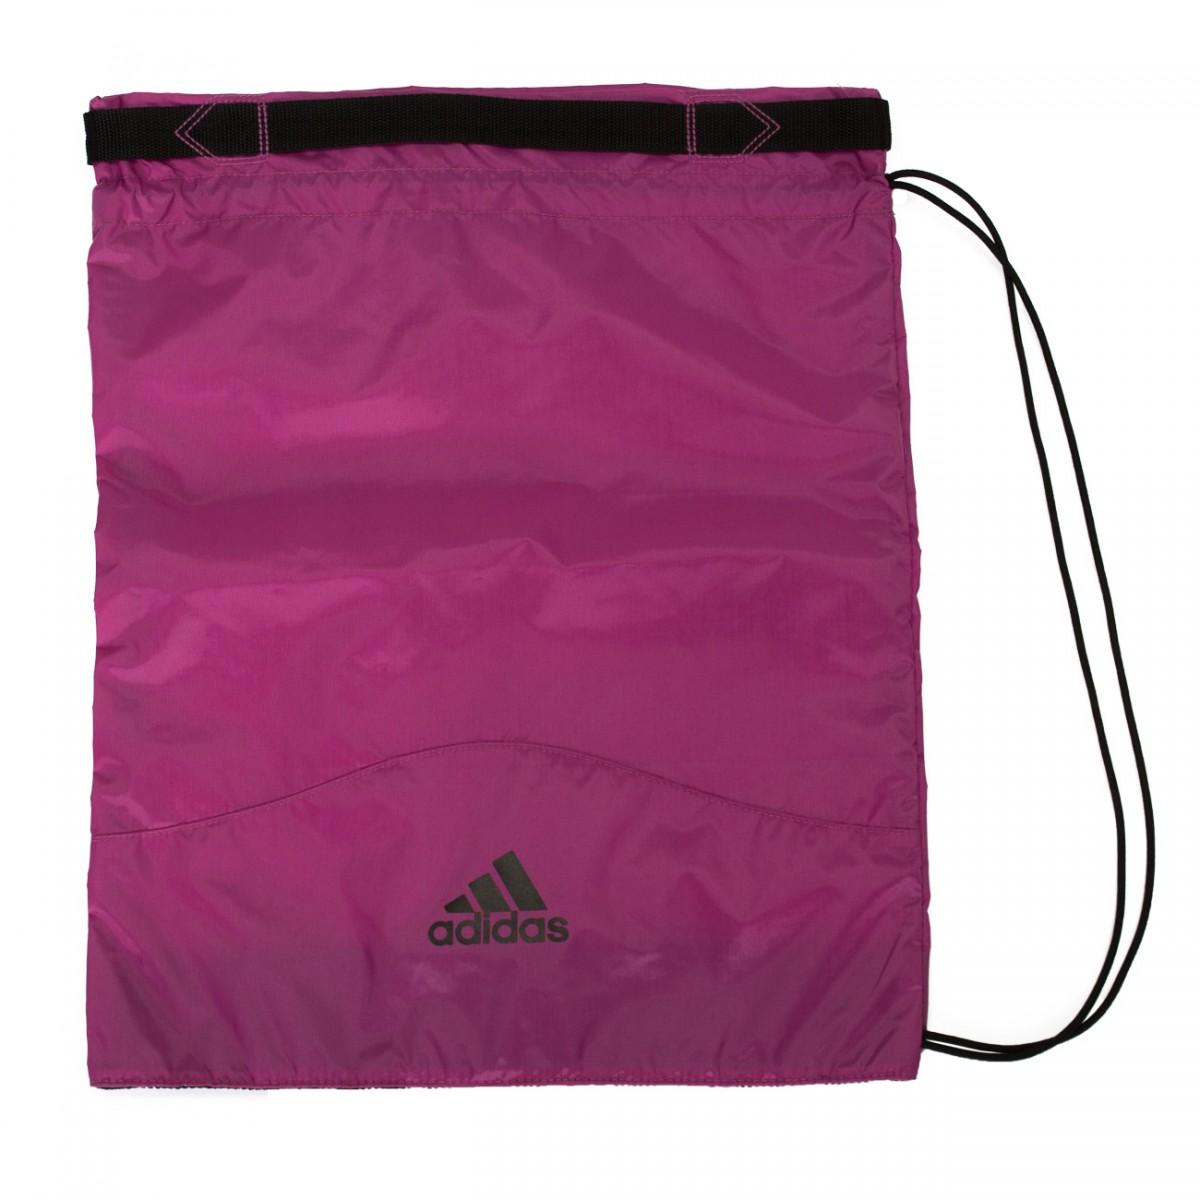 bolsa-adidas-v42745-gymbag-core-005bc0cb0f04b14393df89a20fef8cb0.jpg a36df13edfb